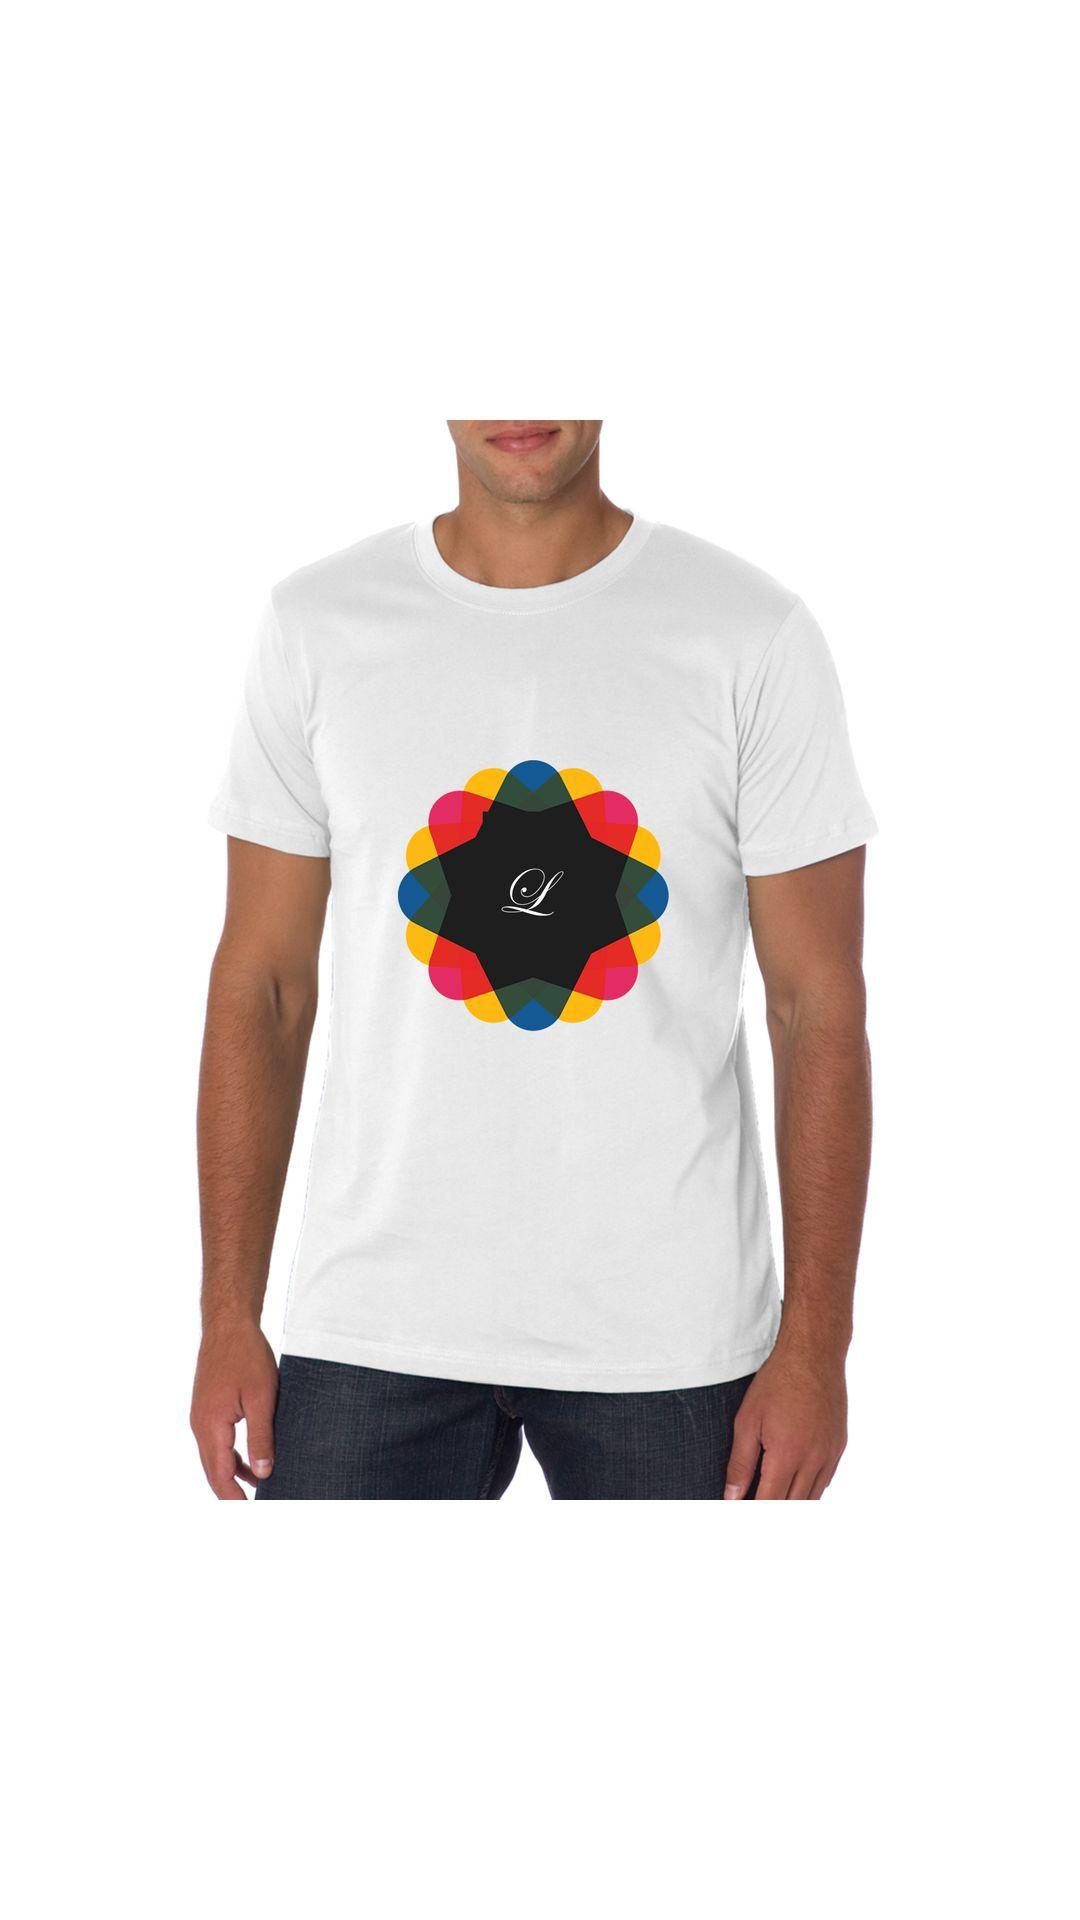 BD Fashion Multi Round T-Shirt Pack of 1